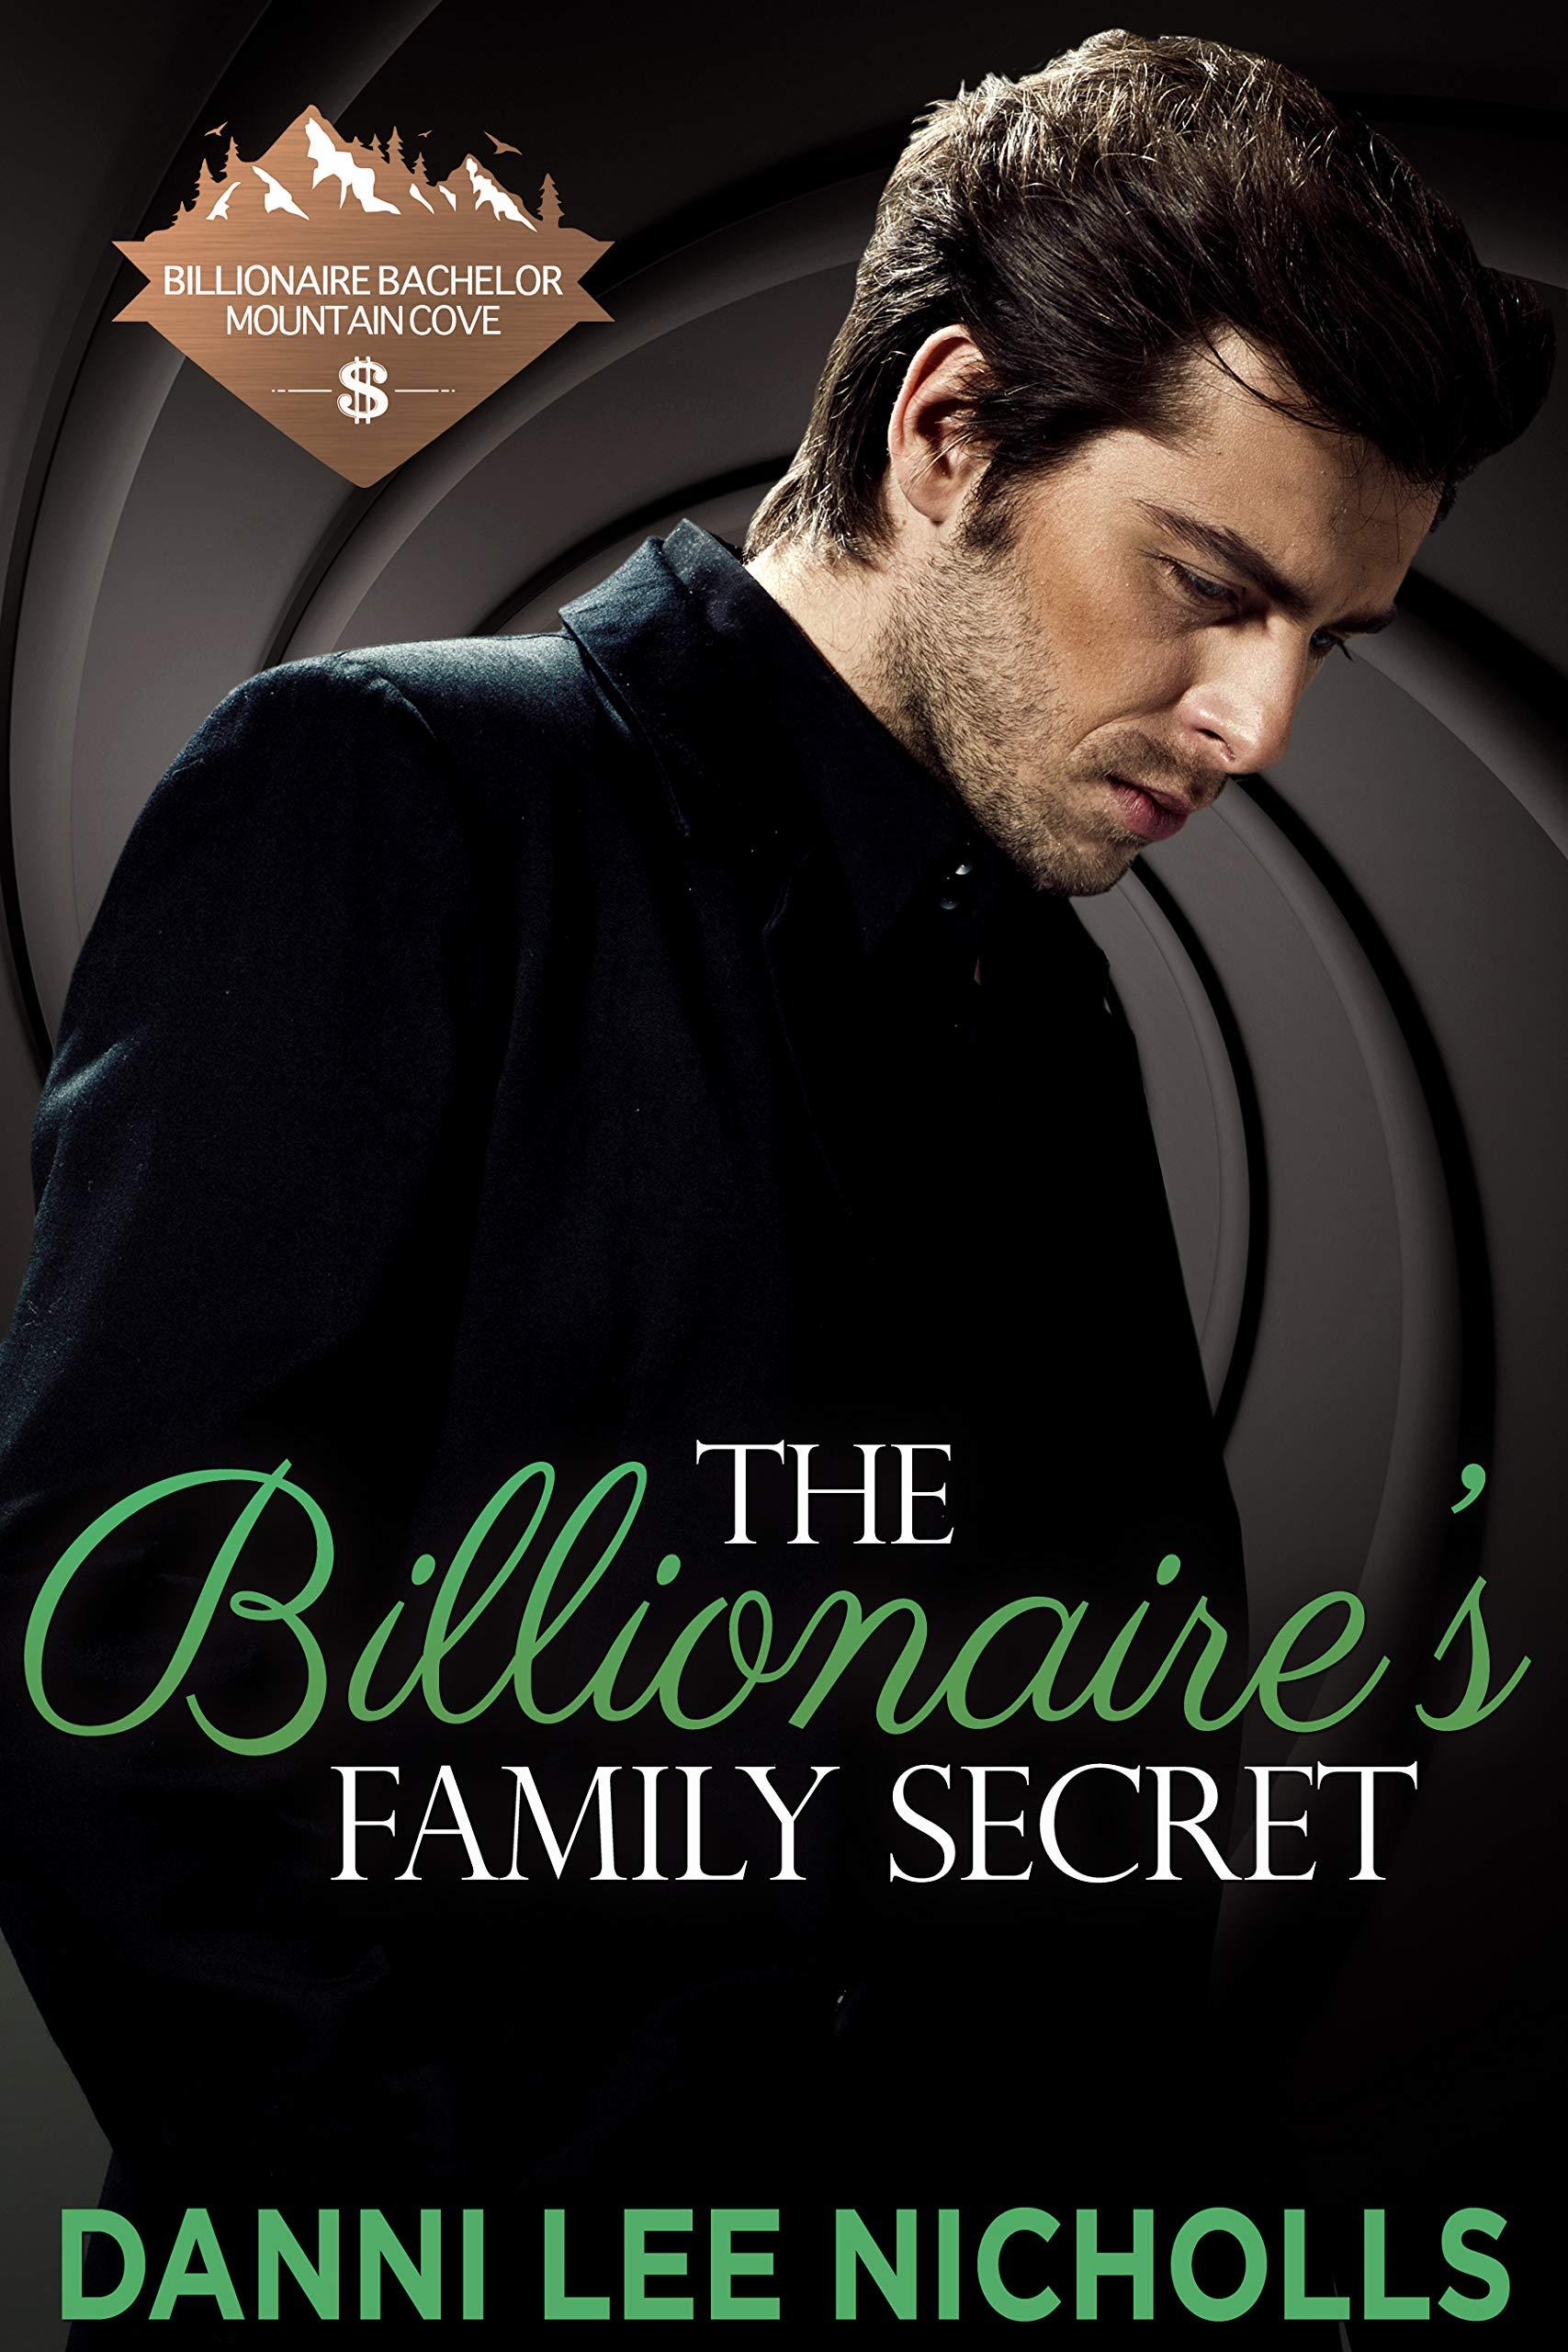 The Billionaire's Family Secret (Billionaire Bachelor Mountain Cove, #15)